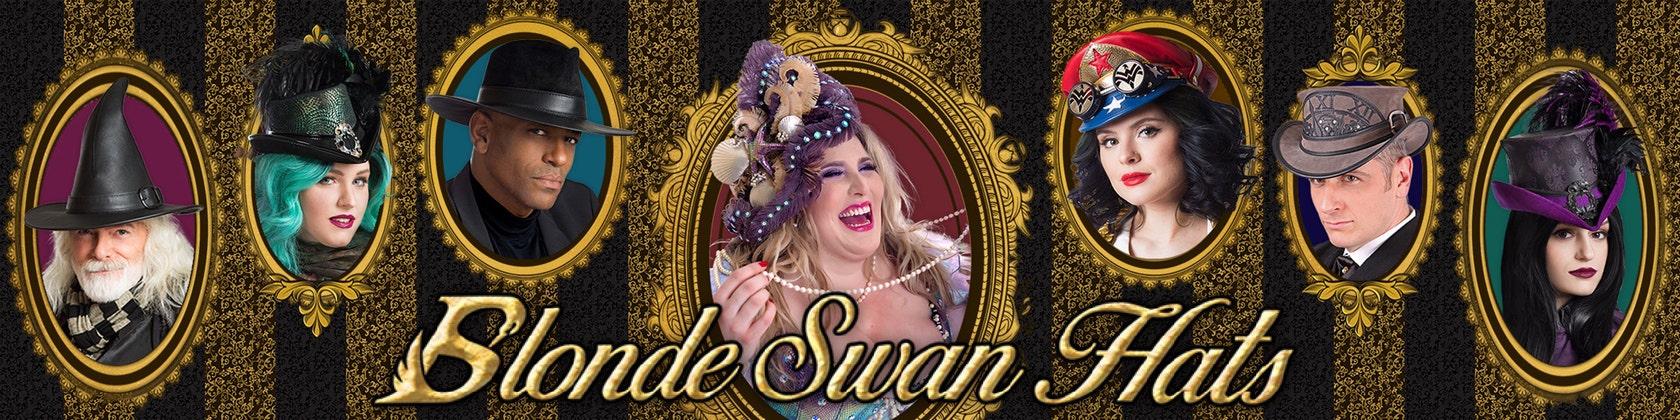 Sur The Par Swan Etsy Blonde Hat Boutique Blondeswanhats XZwiOPuTkl